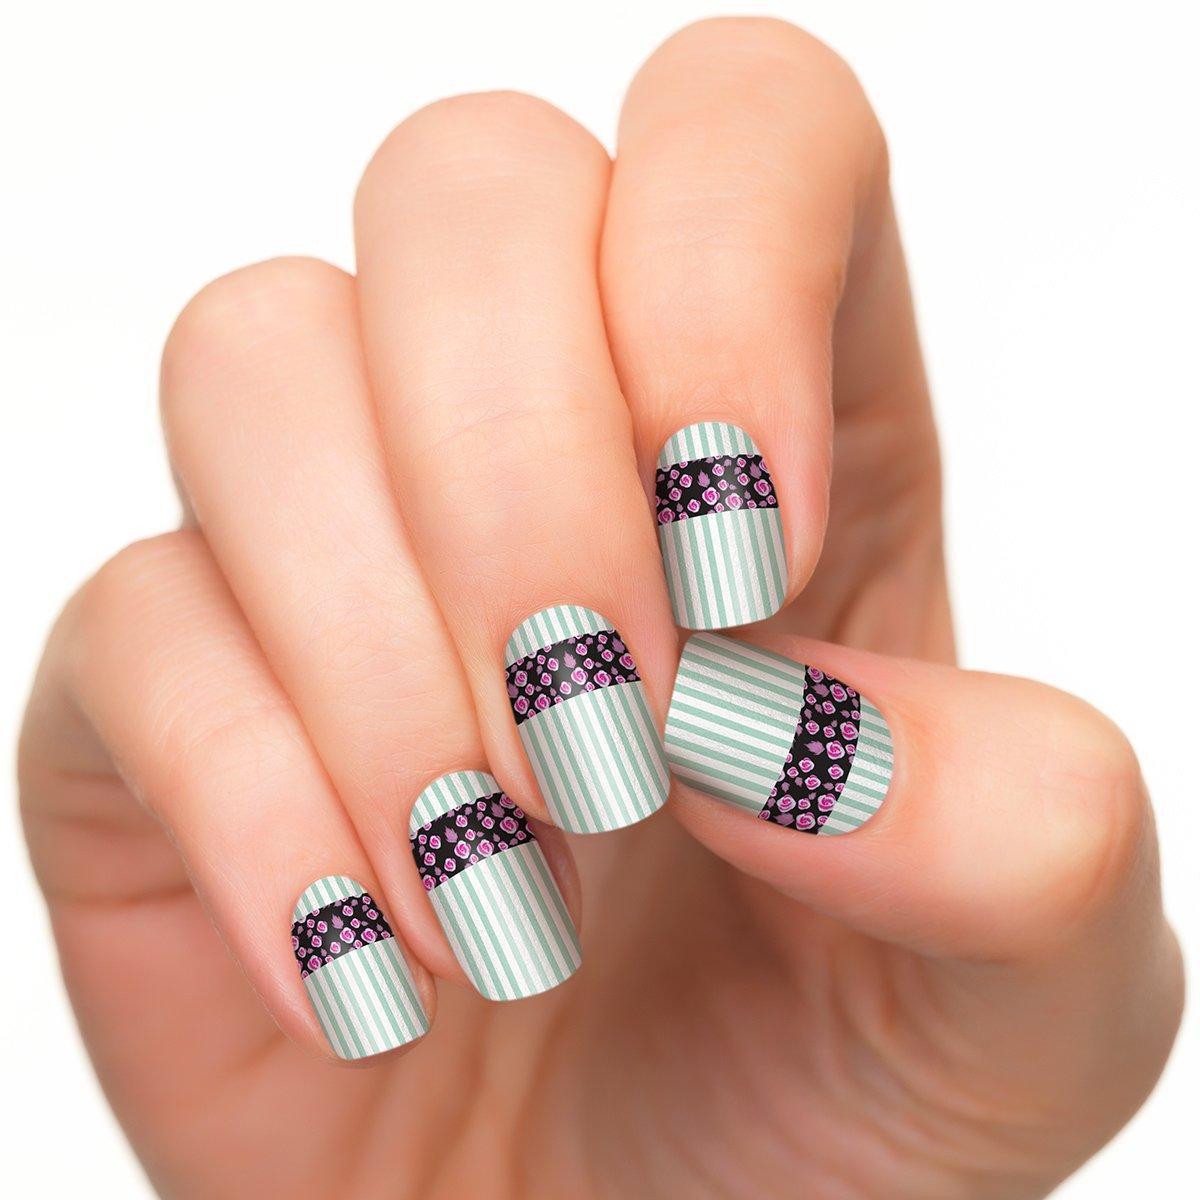 Incoco Nail Polish Strips, Nail Art, Vintage Charm